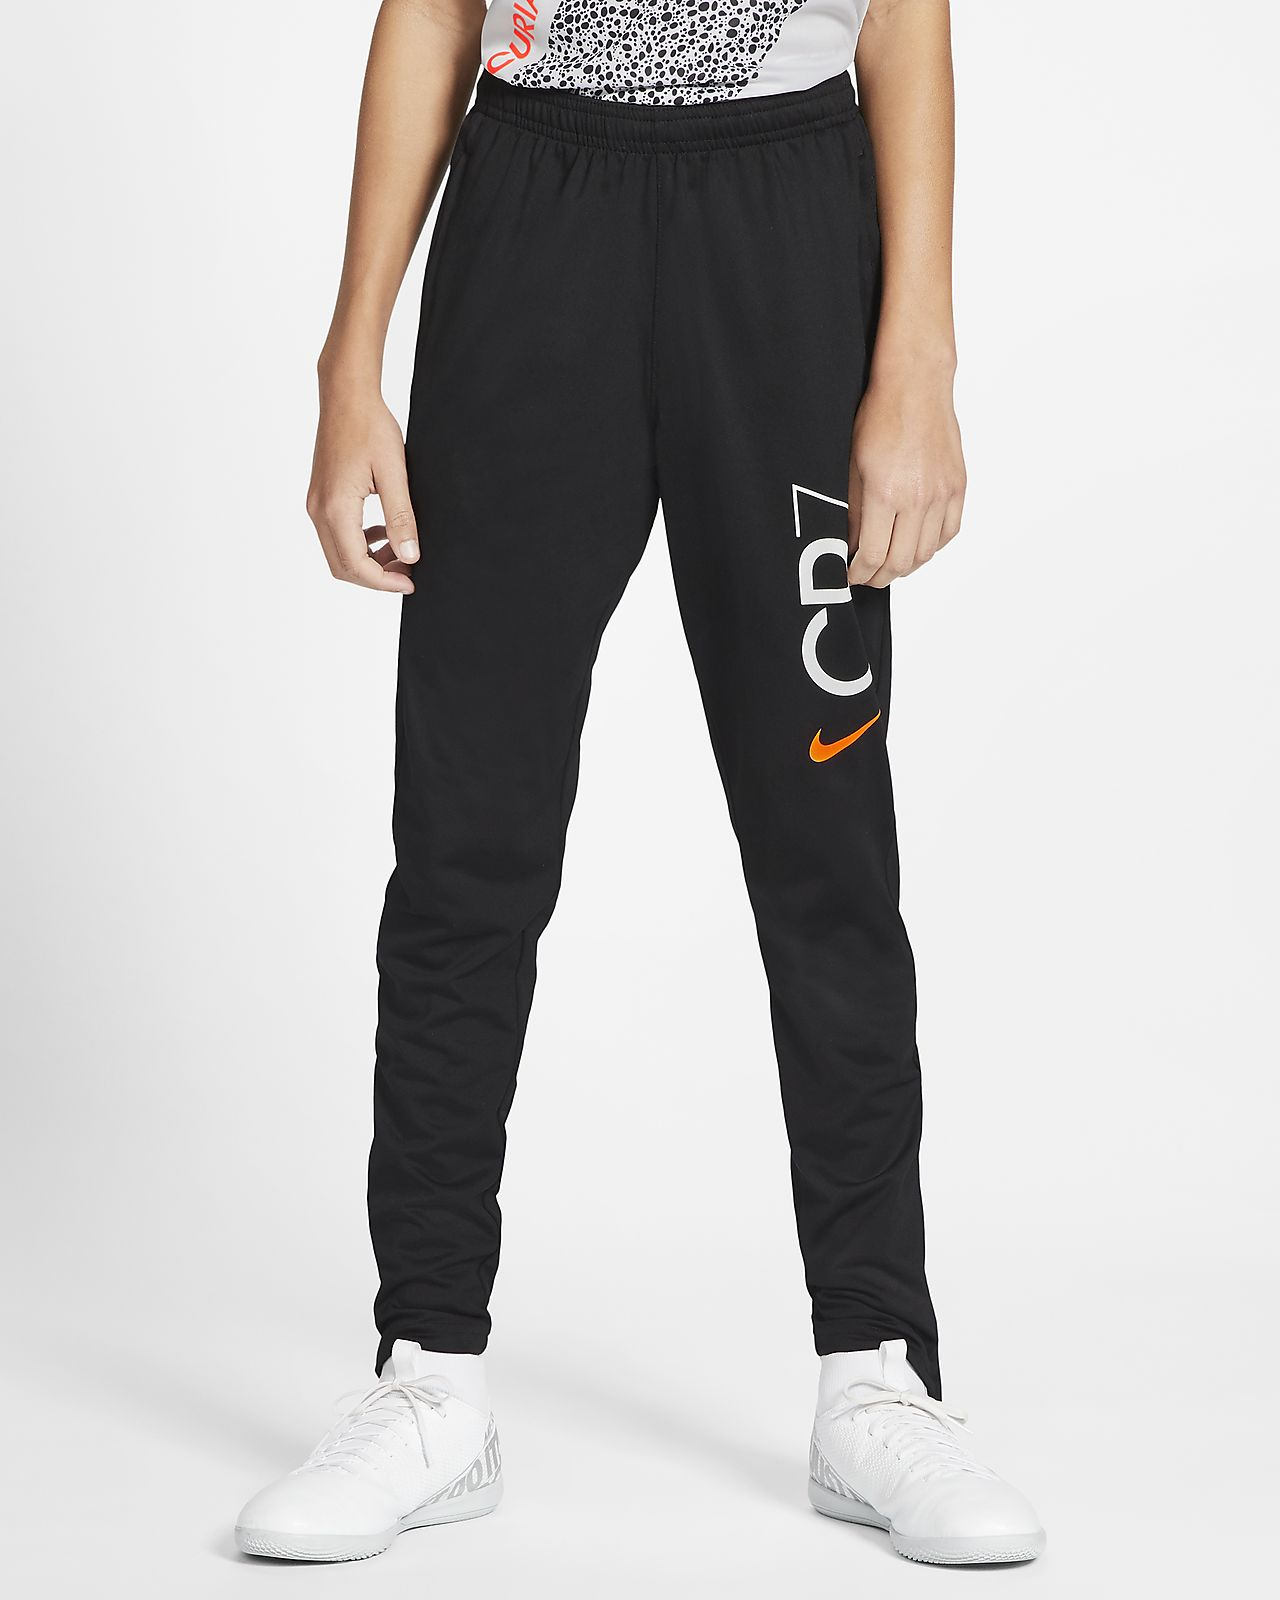 Nike Dri-FIT CR7 Big Kids' Soccer Pants